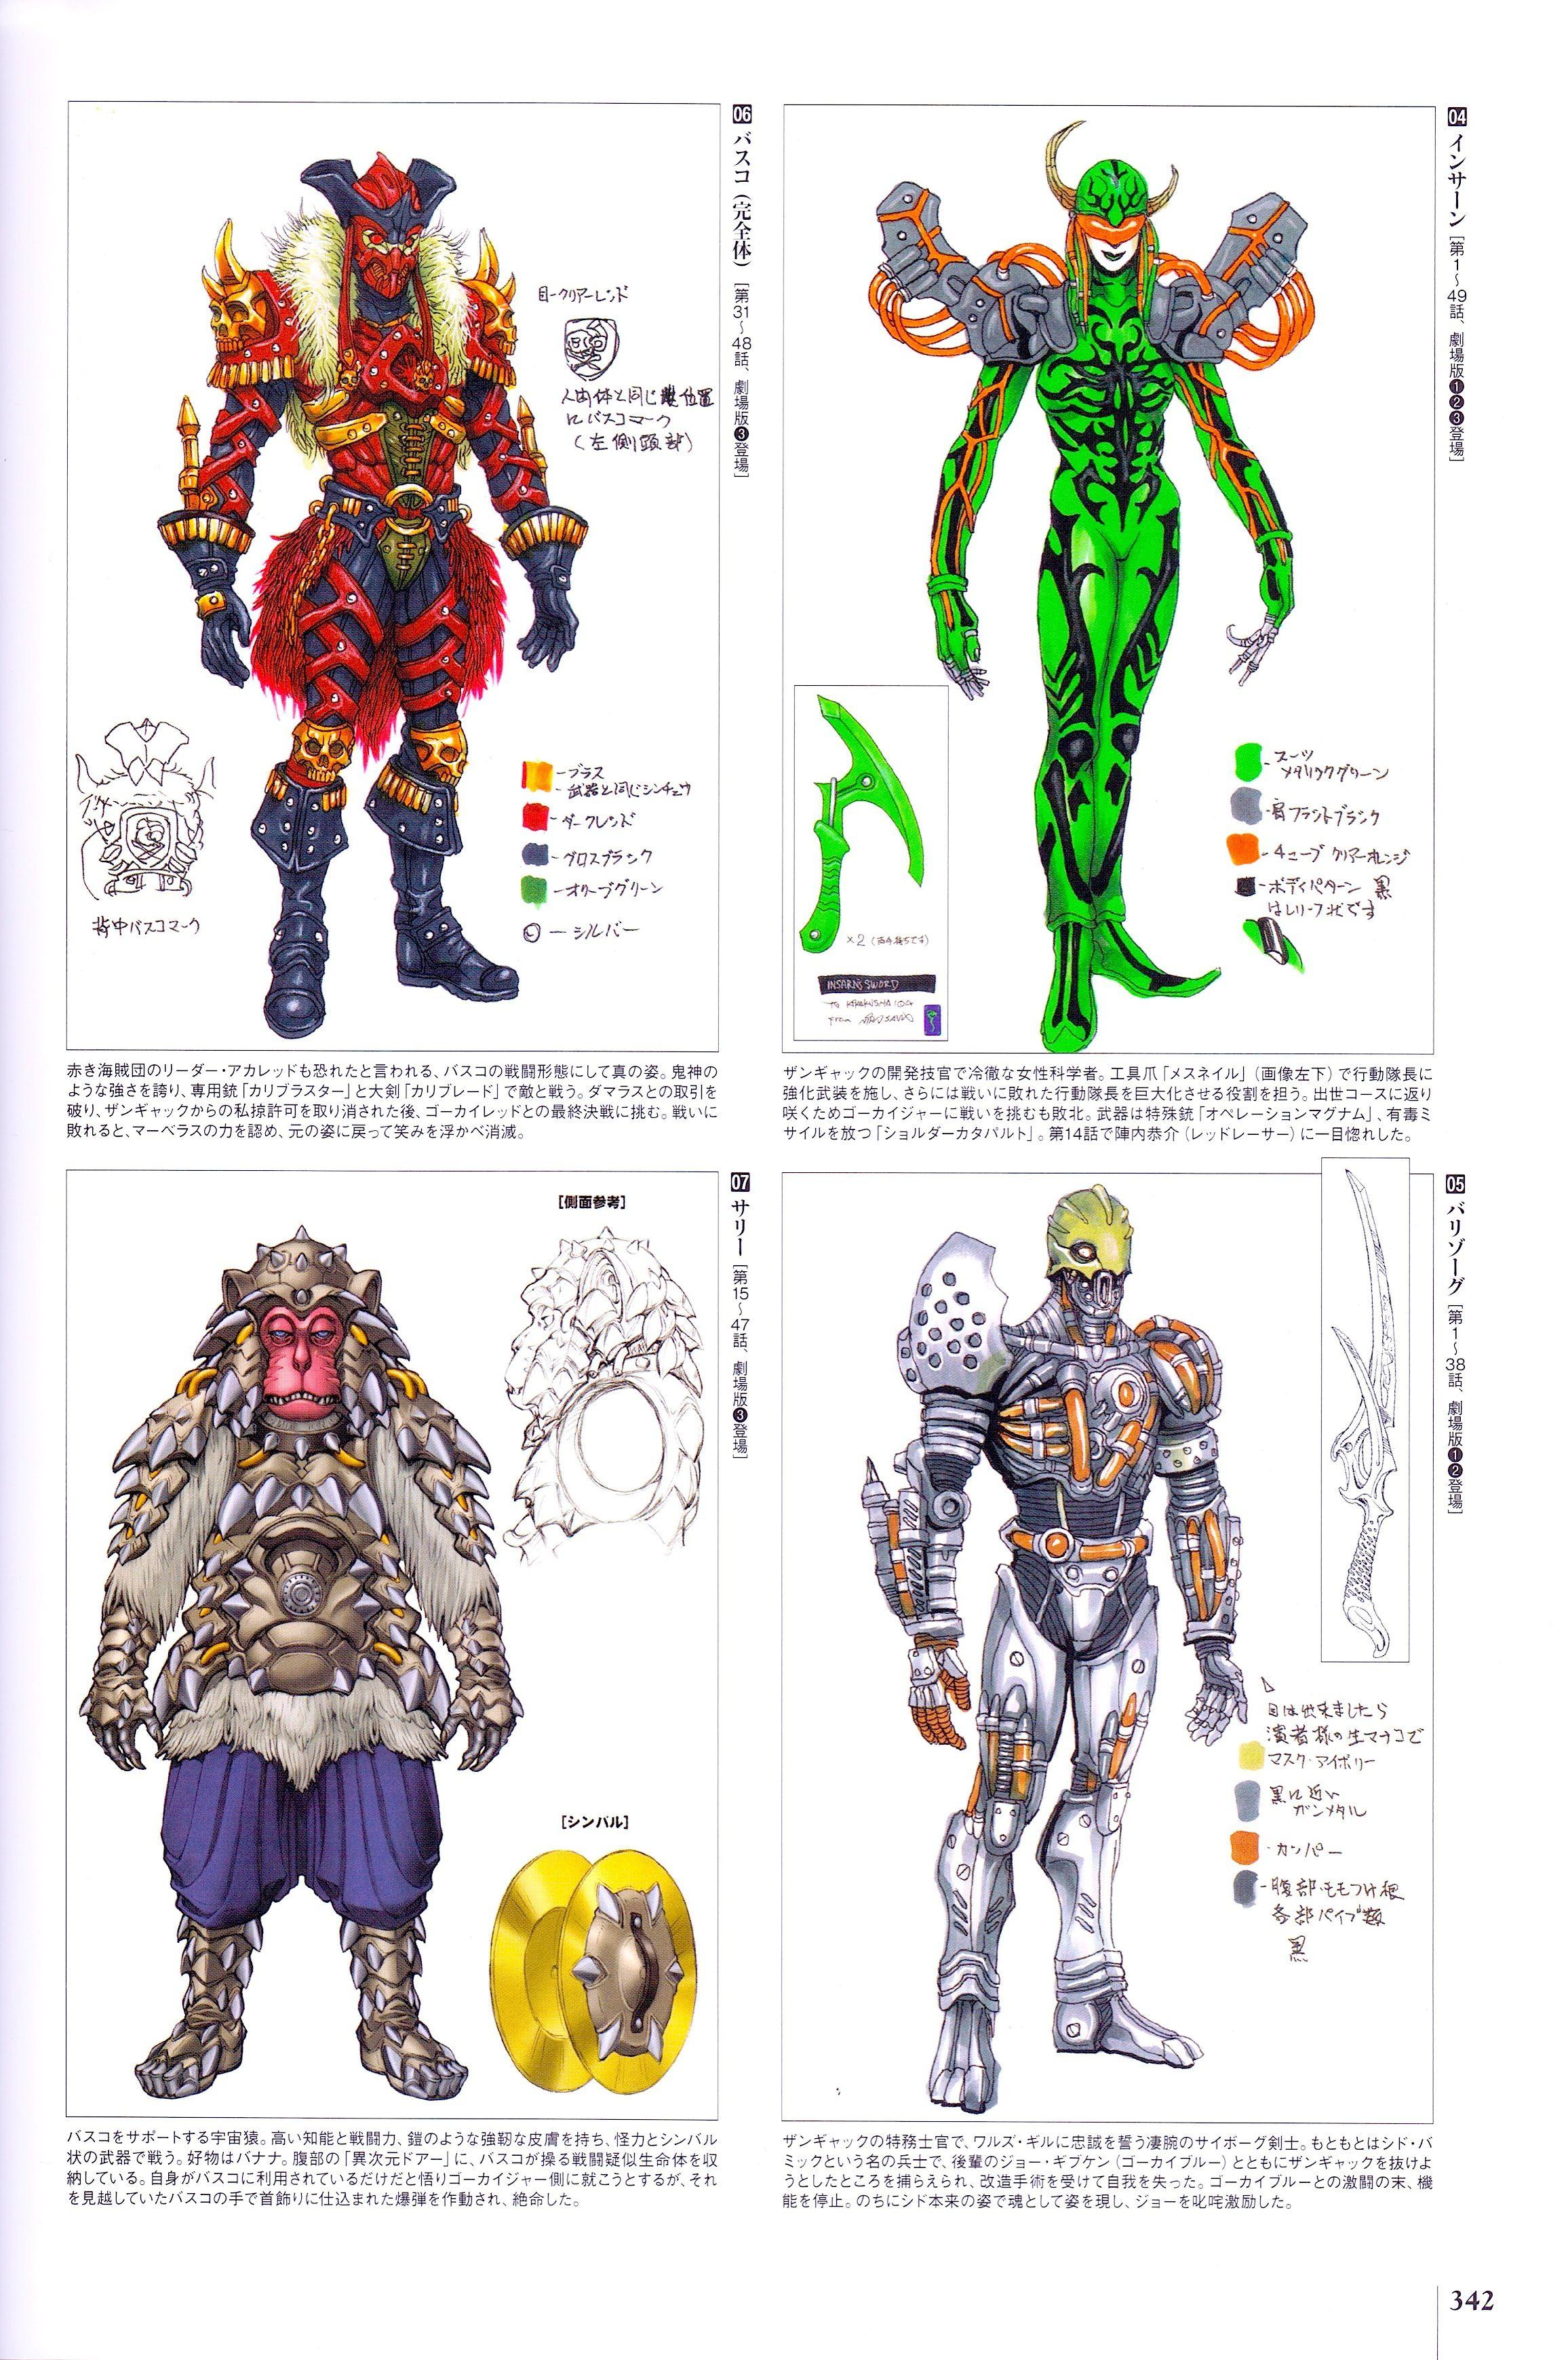 Kaiju History 2011 Gokaiger | Character concept | Monster